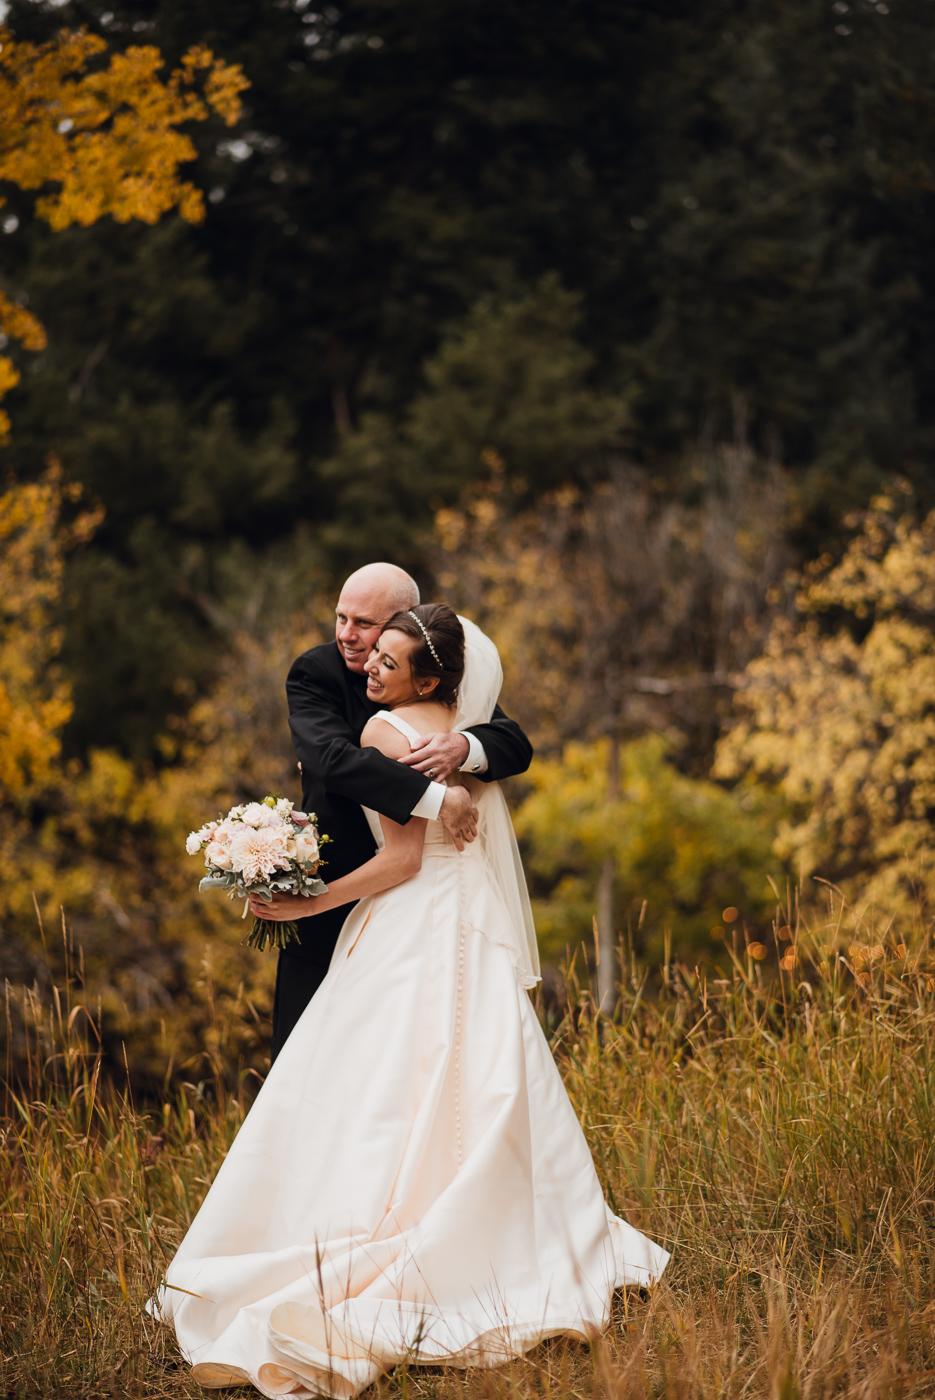 Candice Rawlin Wedding PHOCO Photography Pines Genesee Golden Colorado Fog -19.jpg